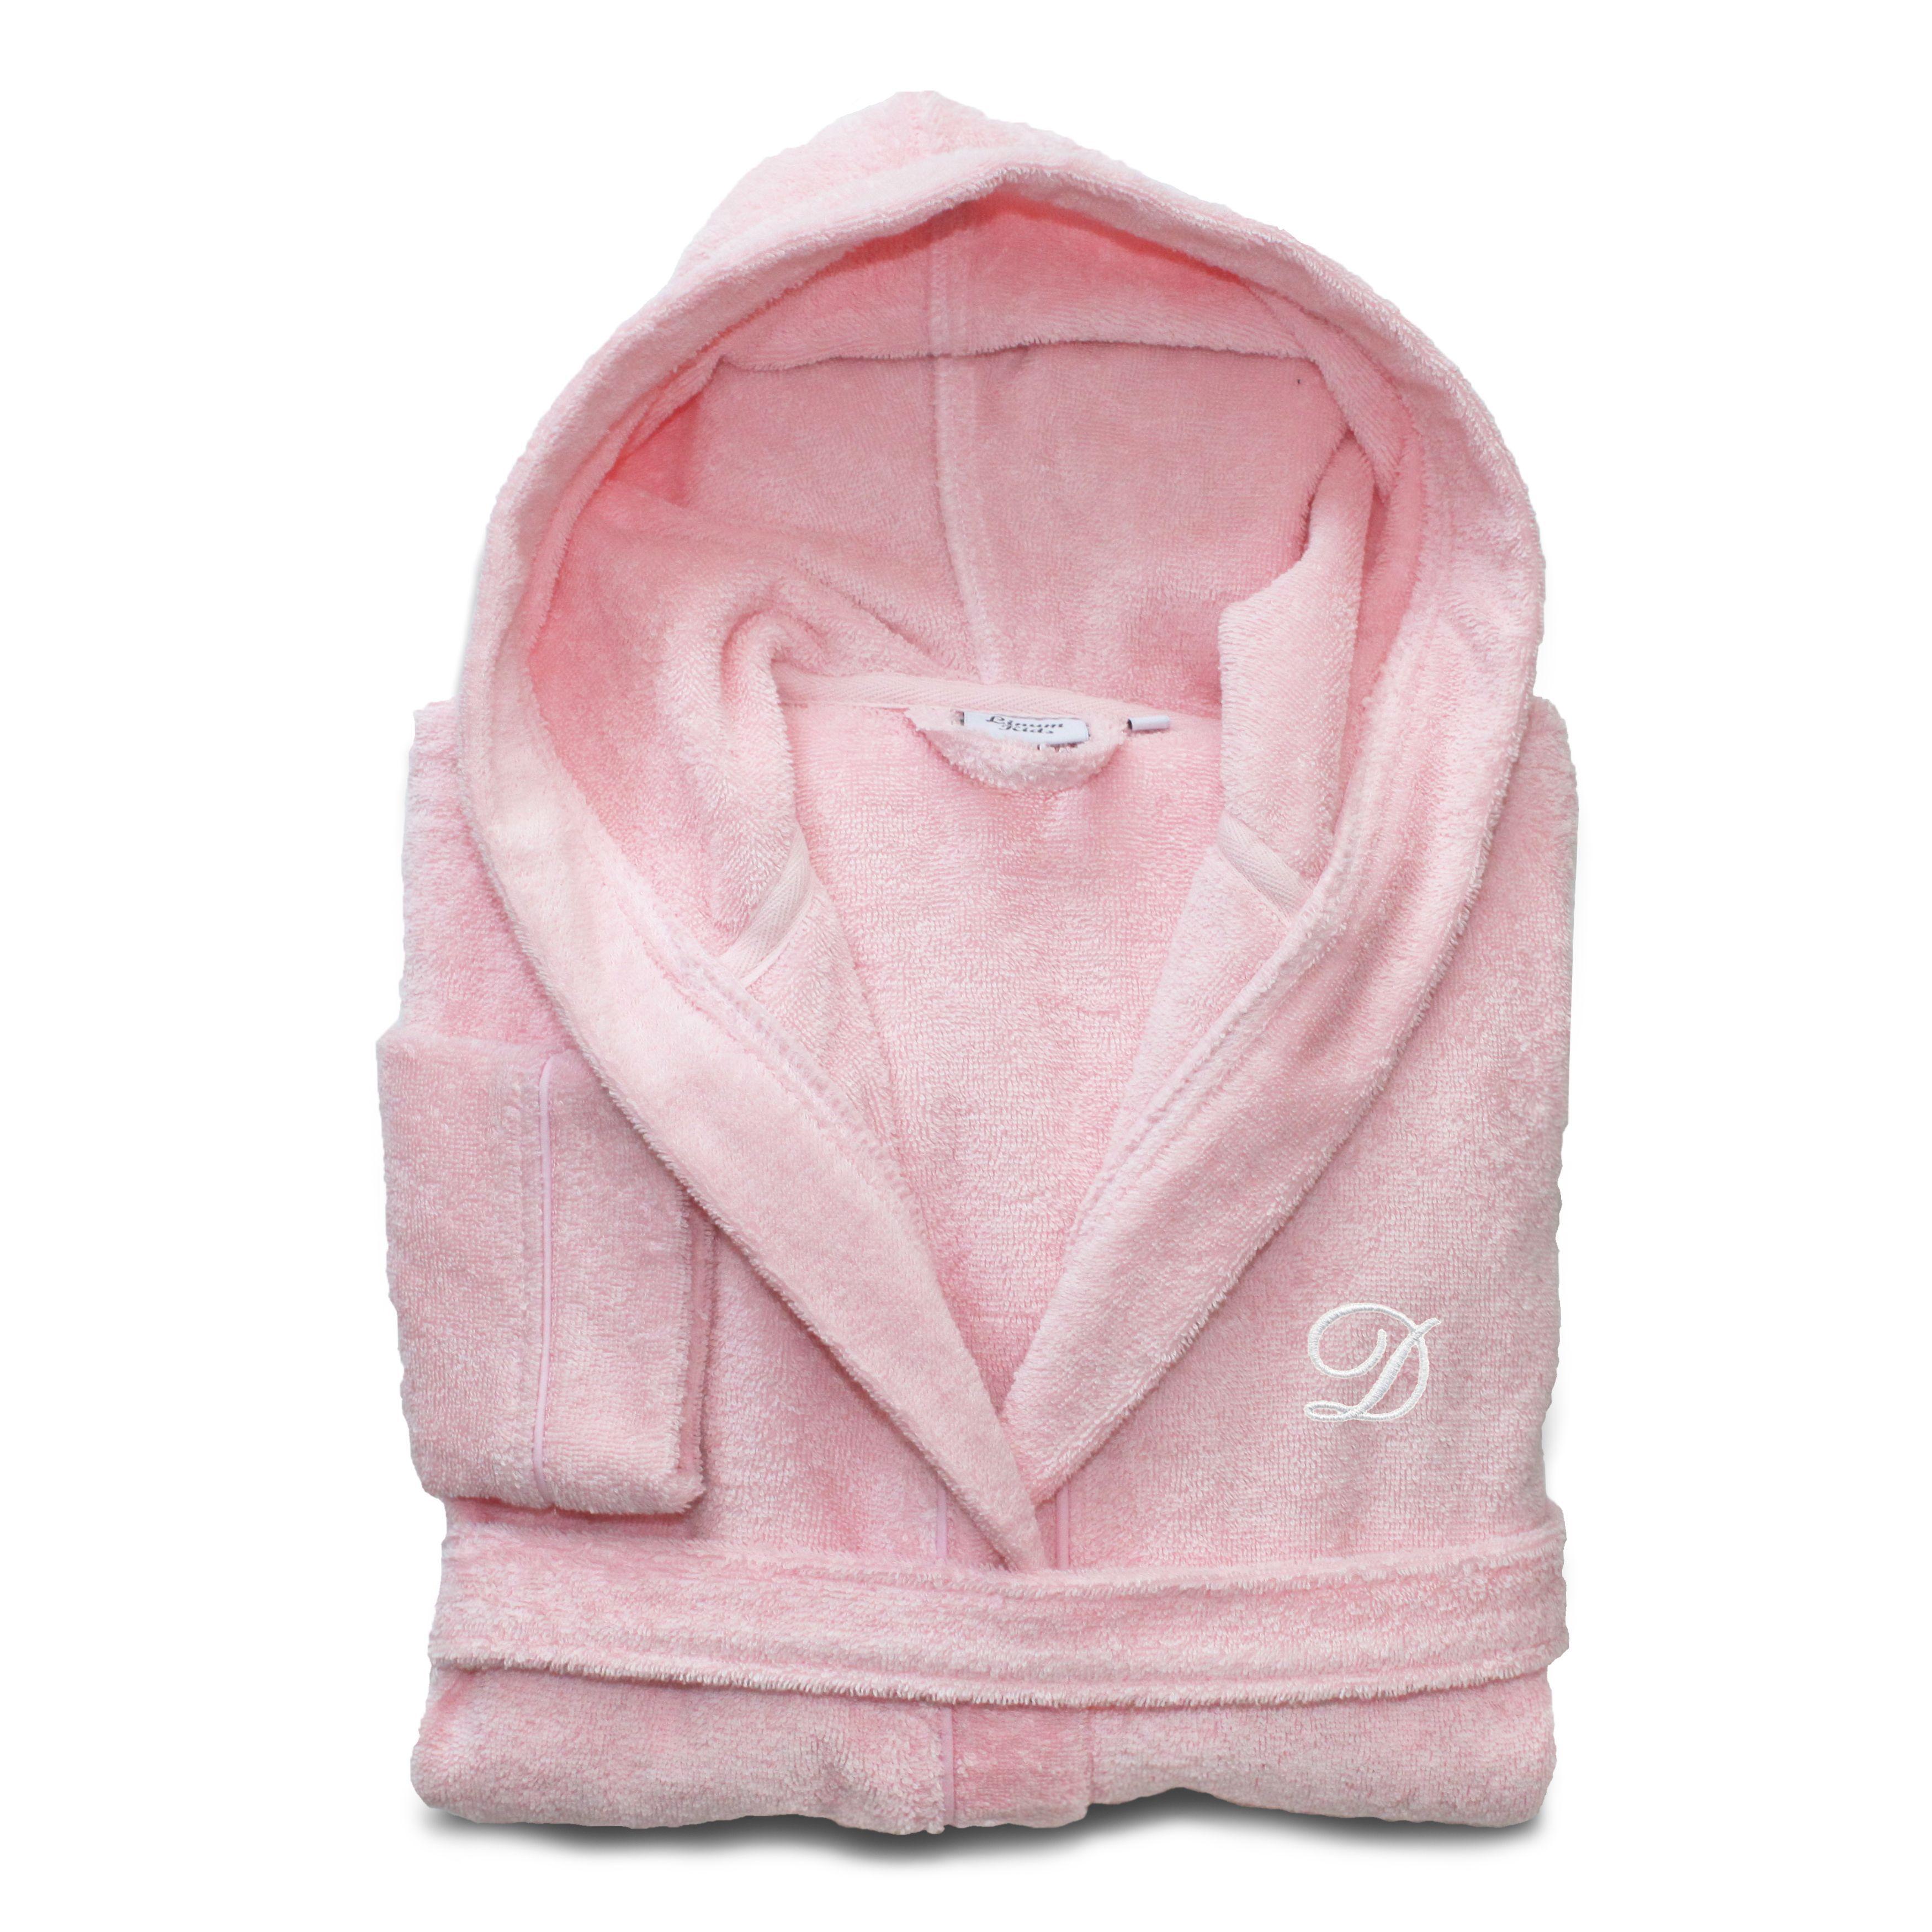 Sweet Kids Turkish Cotton Terry Pretty Pink with White Monogram ... c44a57eb3